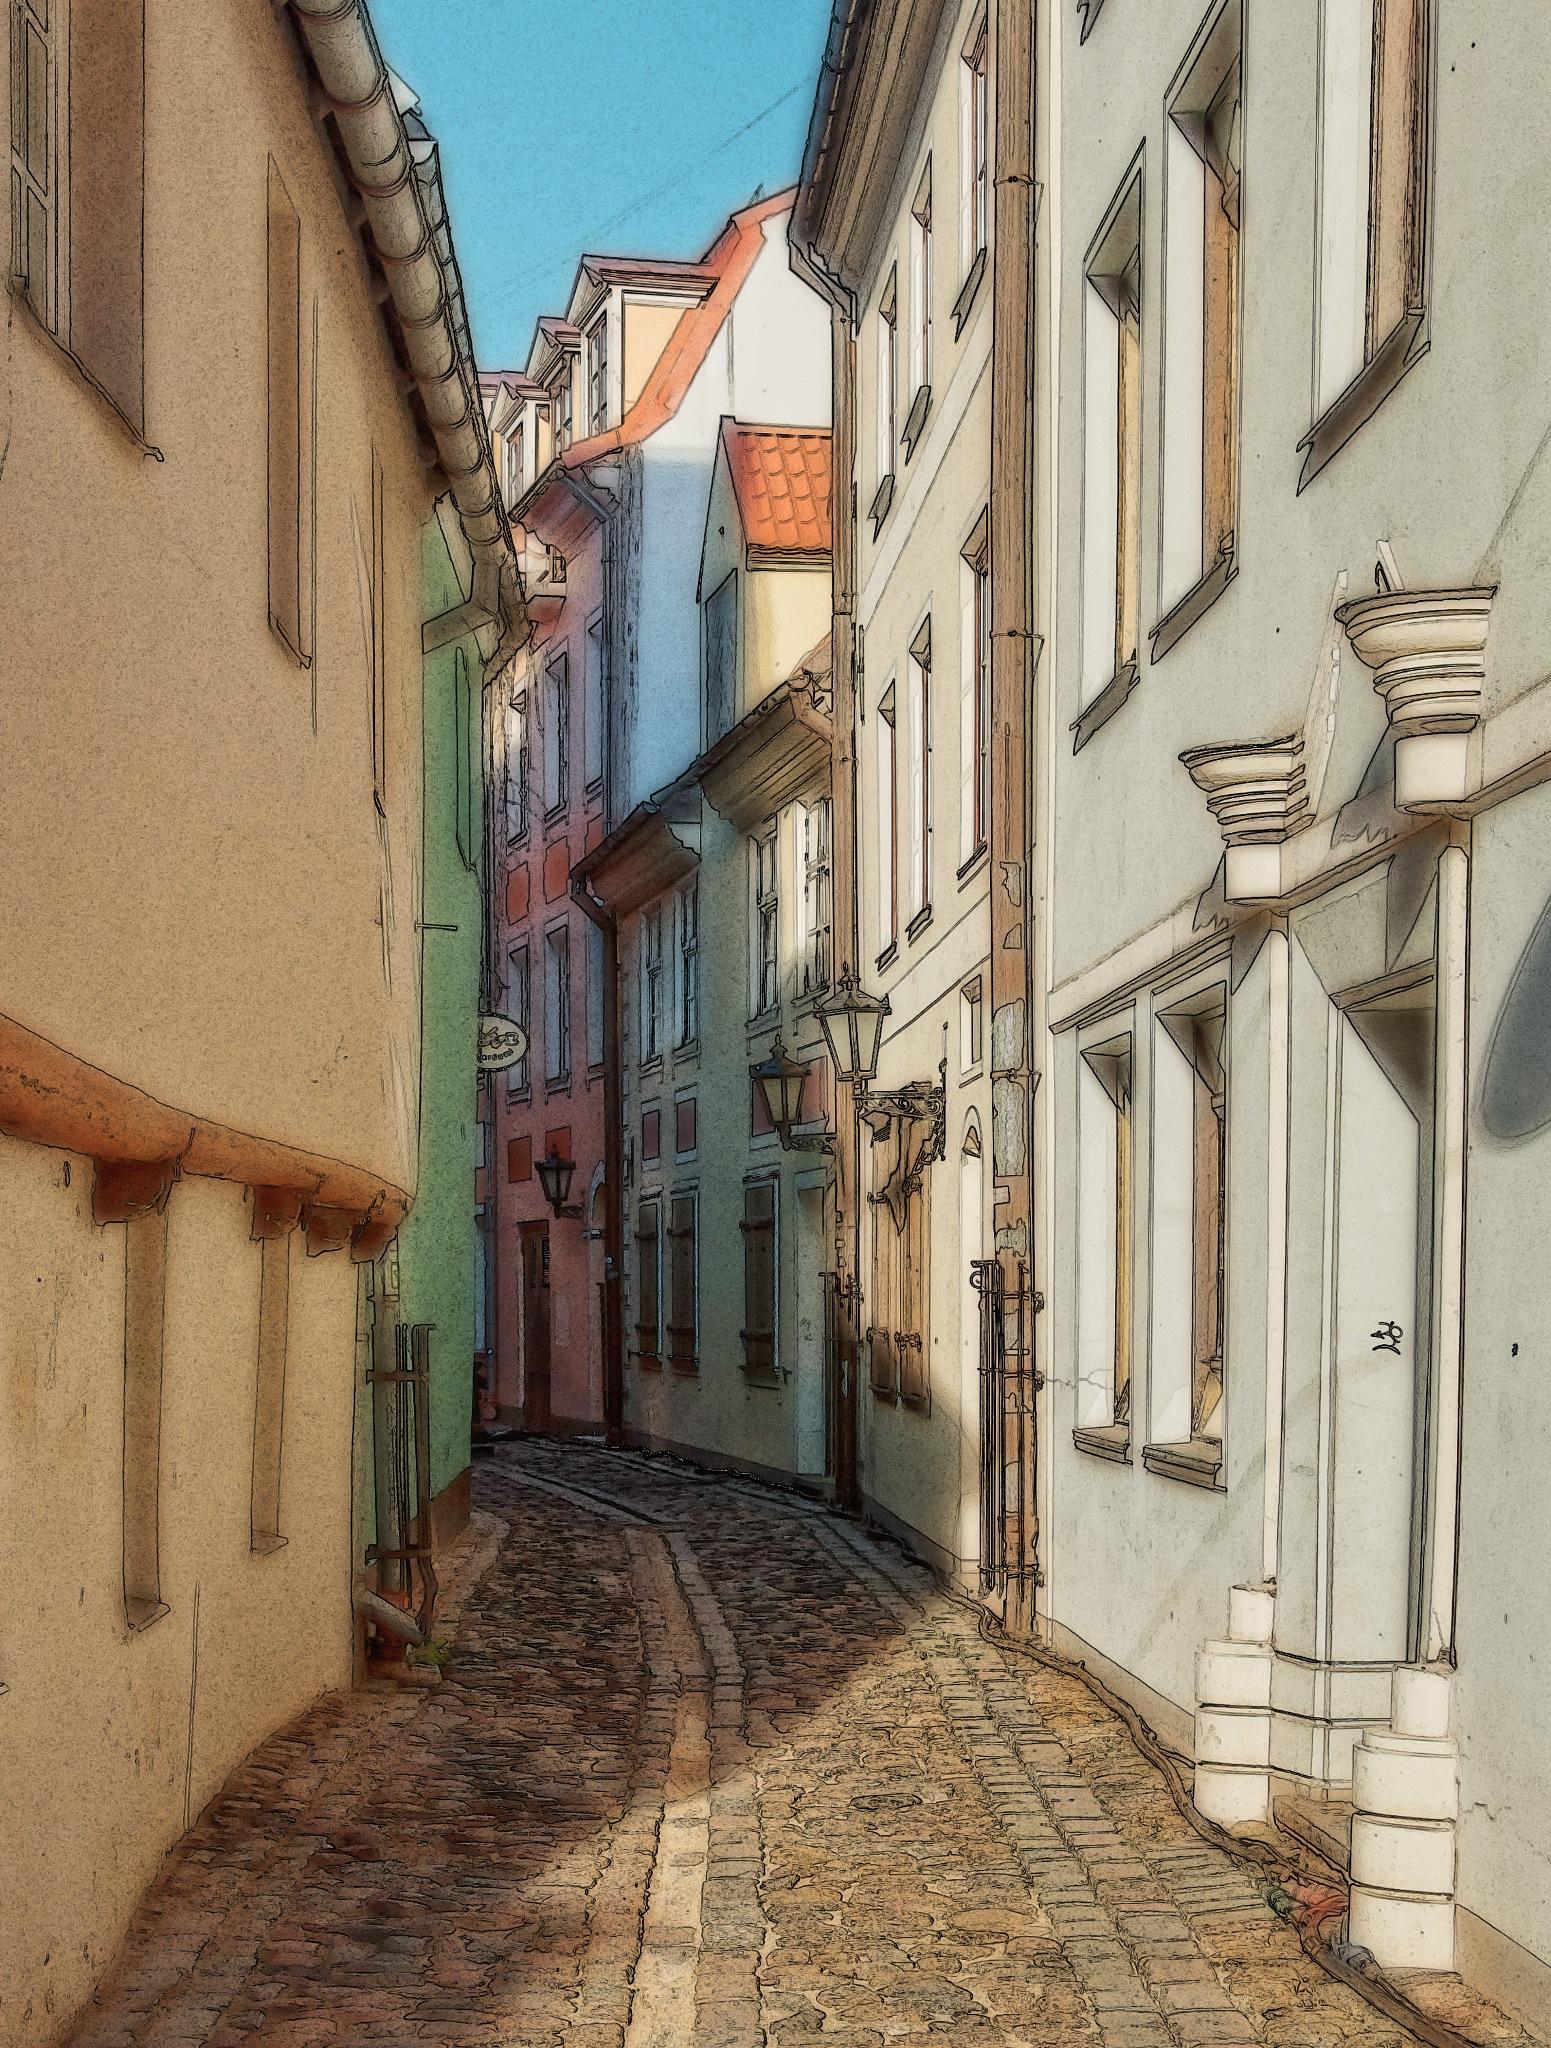 Rīga by ilkensguntis